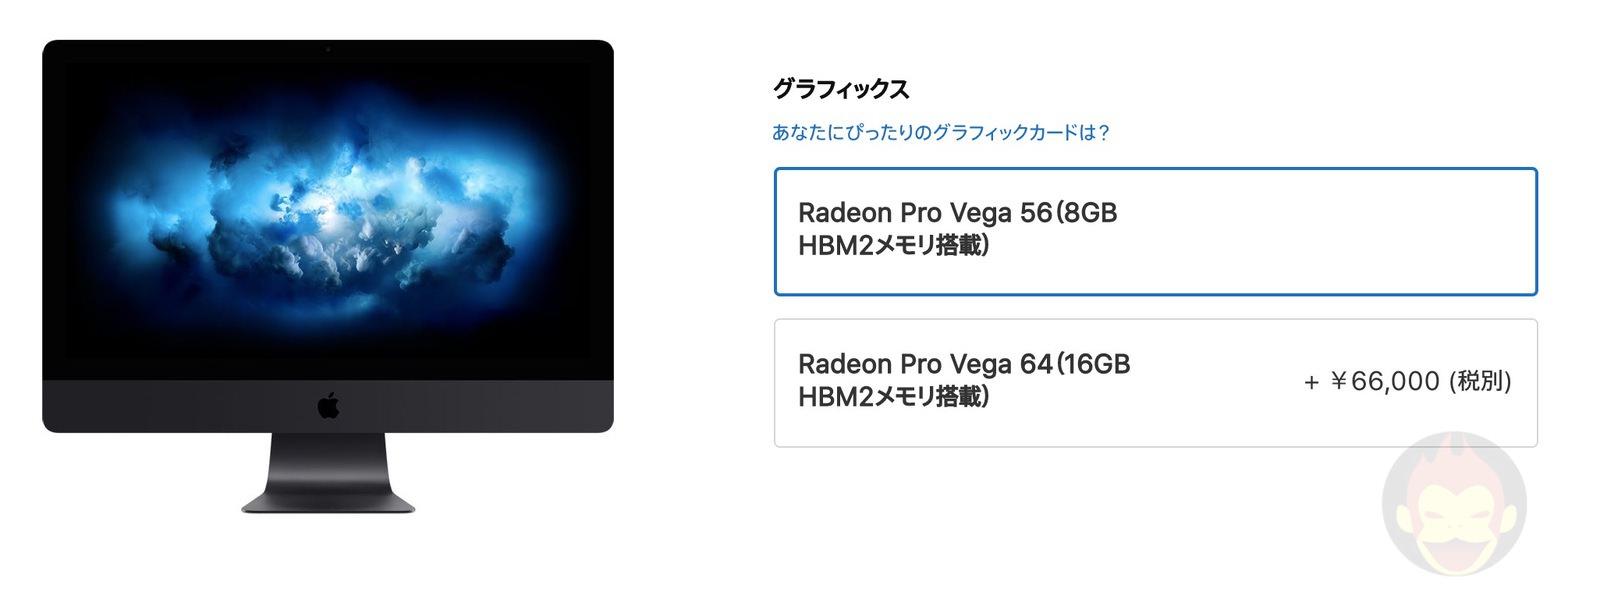 IMac Pro gpu option 01